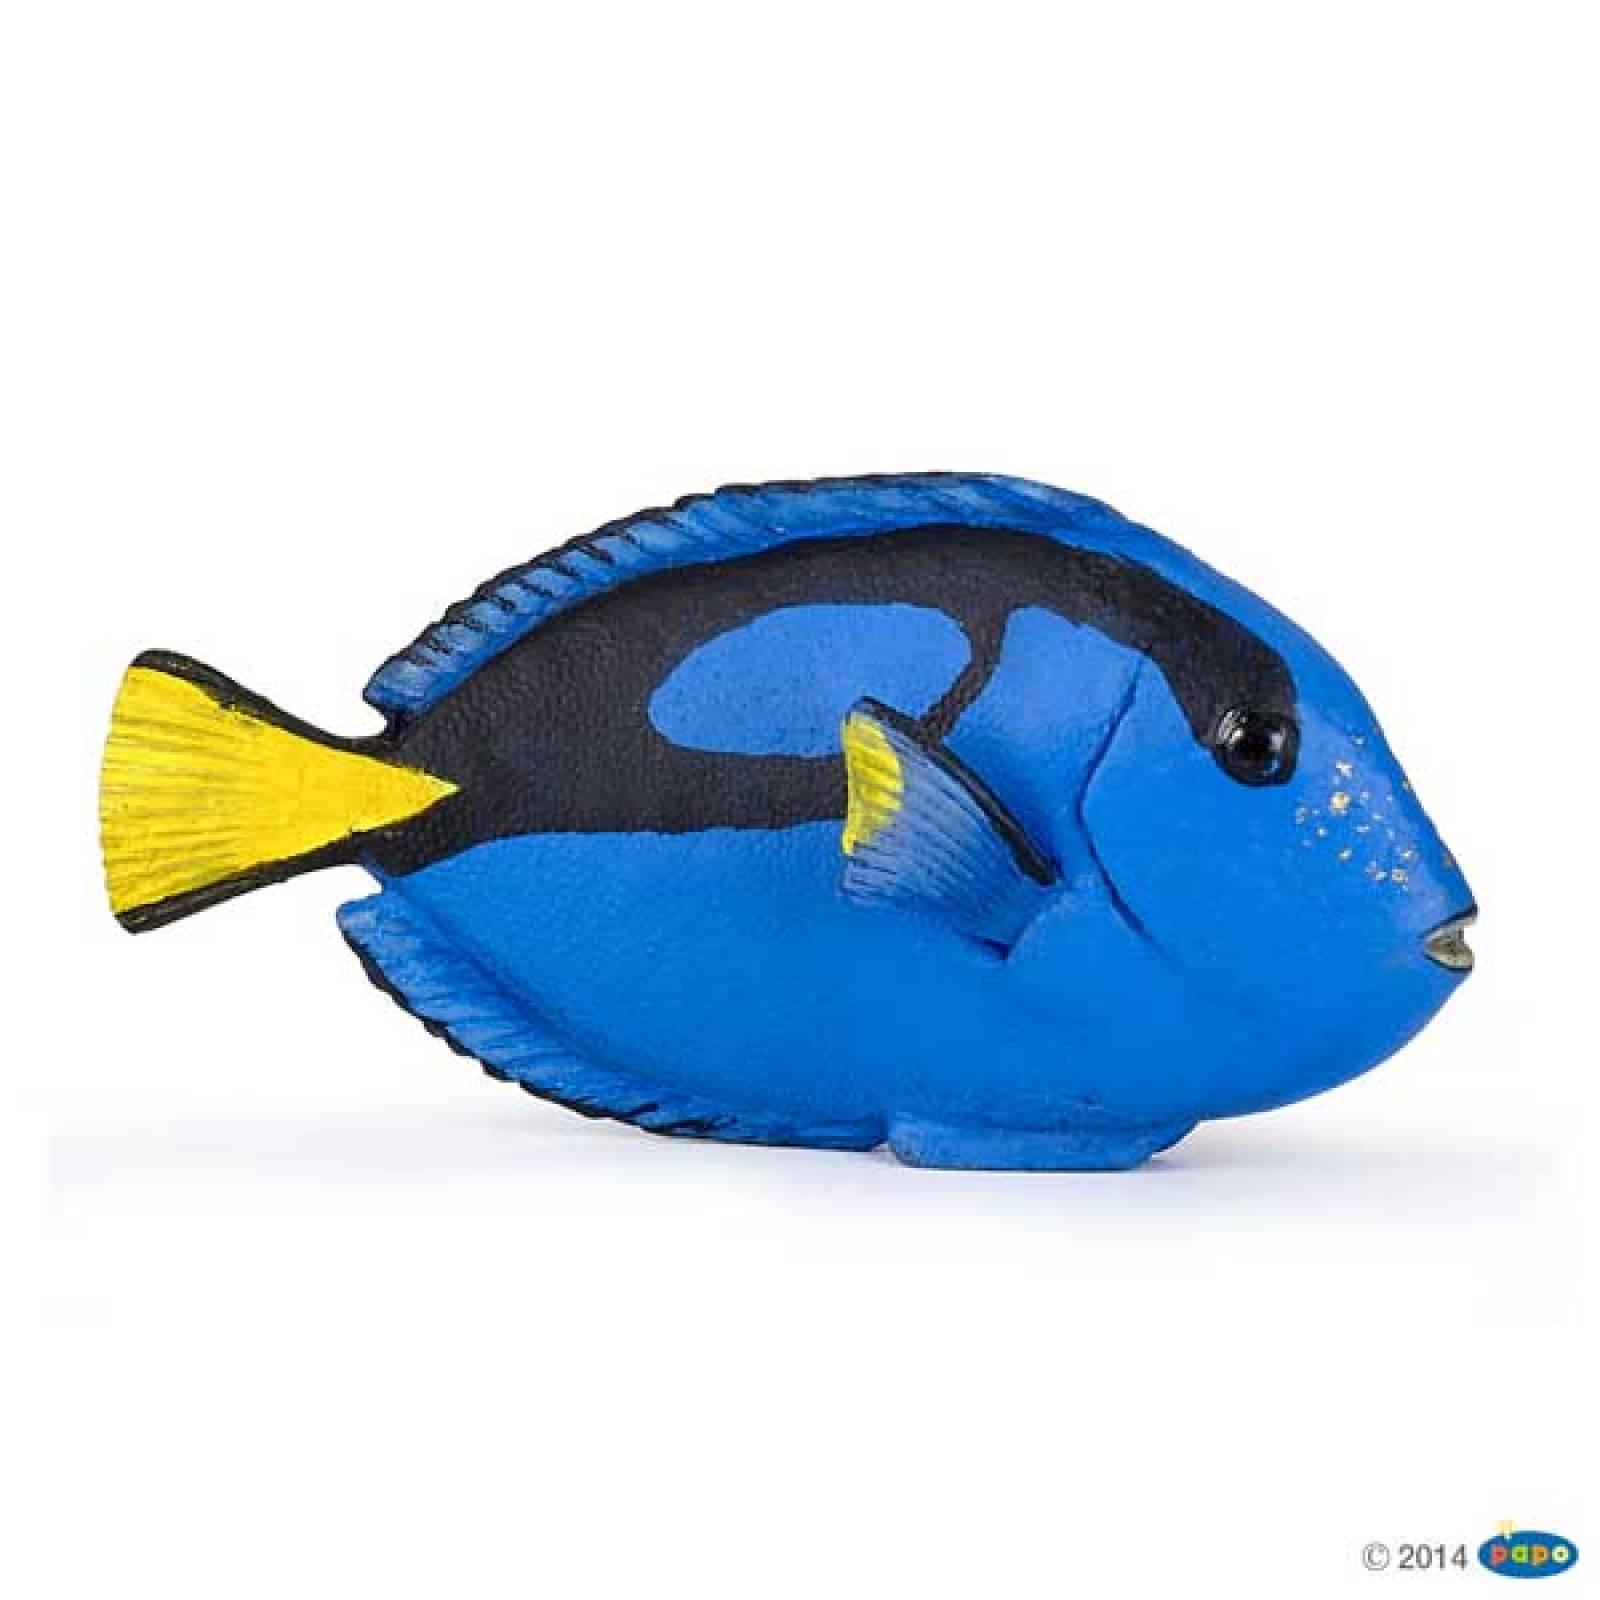 Surgeonfish PAPO WILD ANIMAL